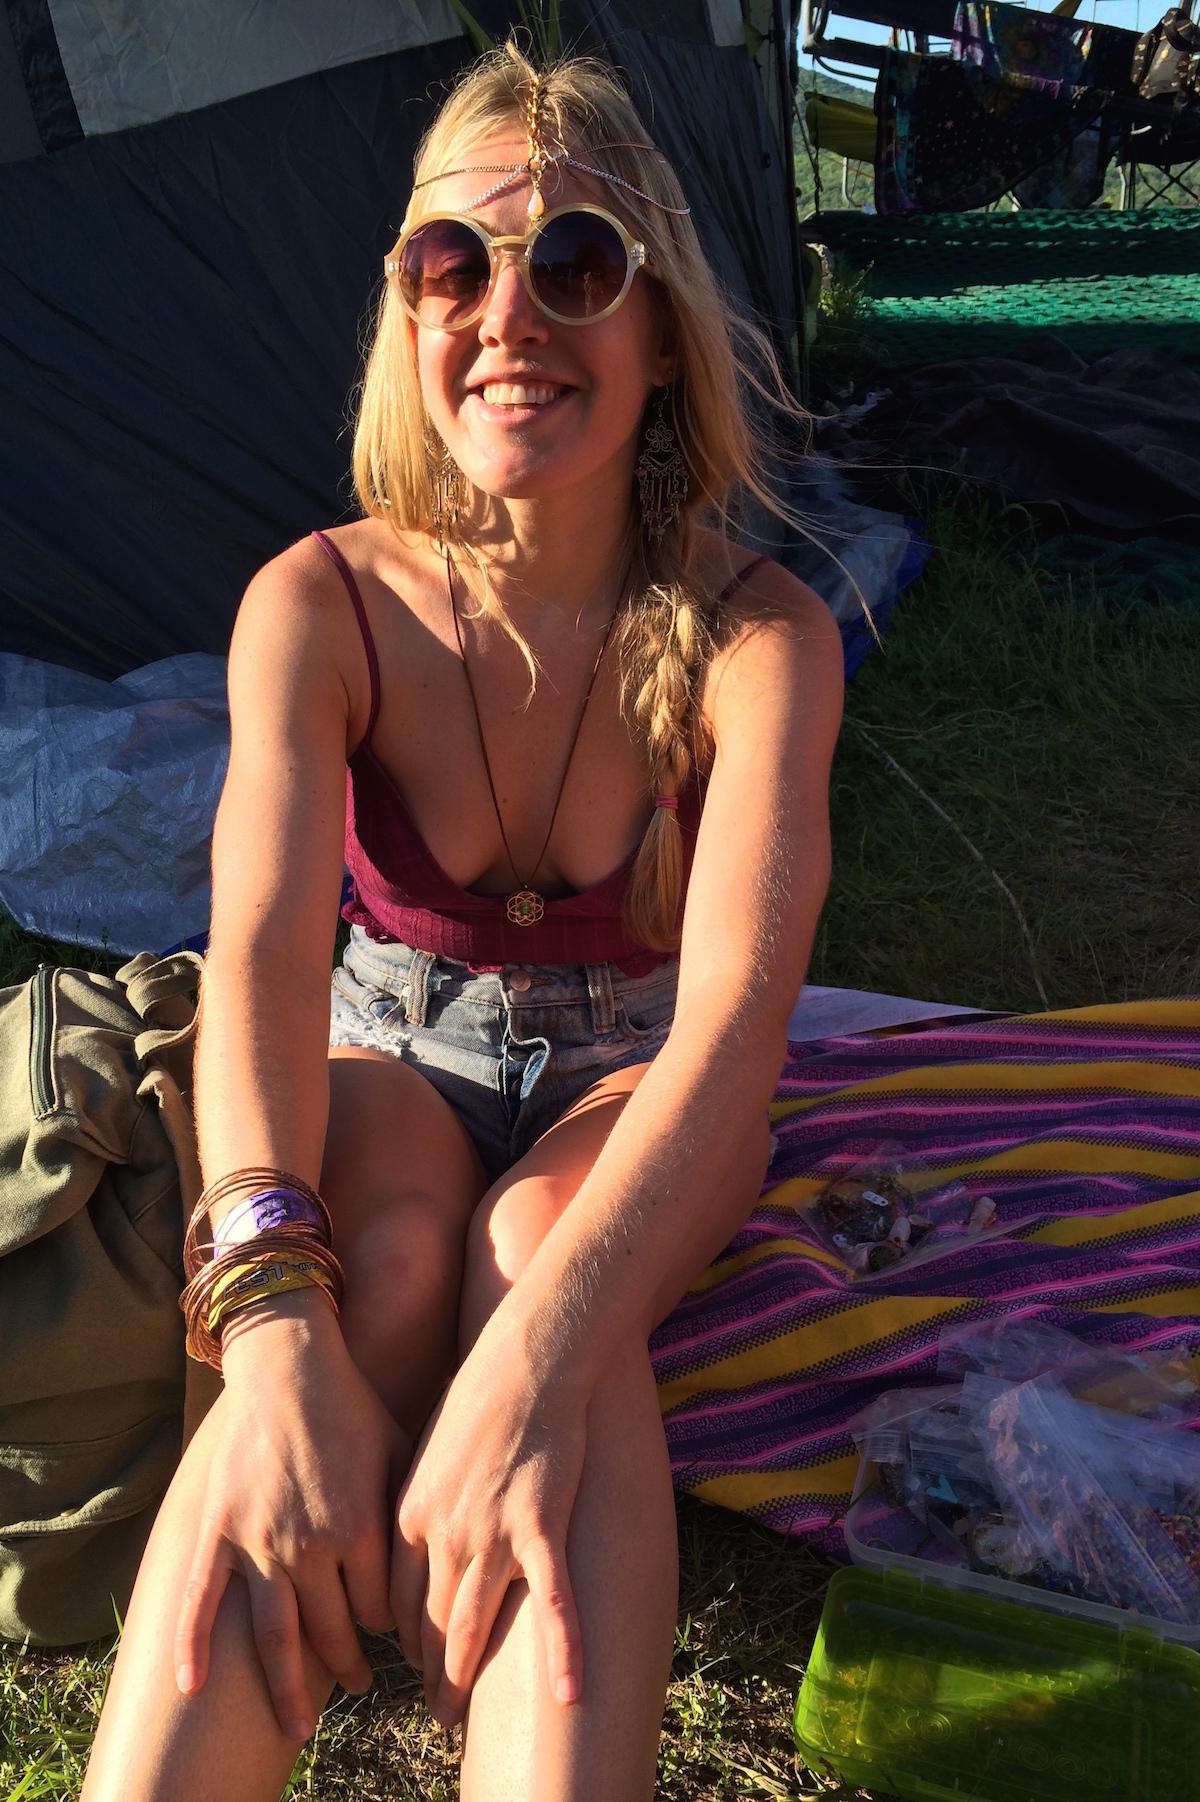 Chicks Hippie Where Meet To